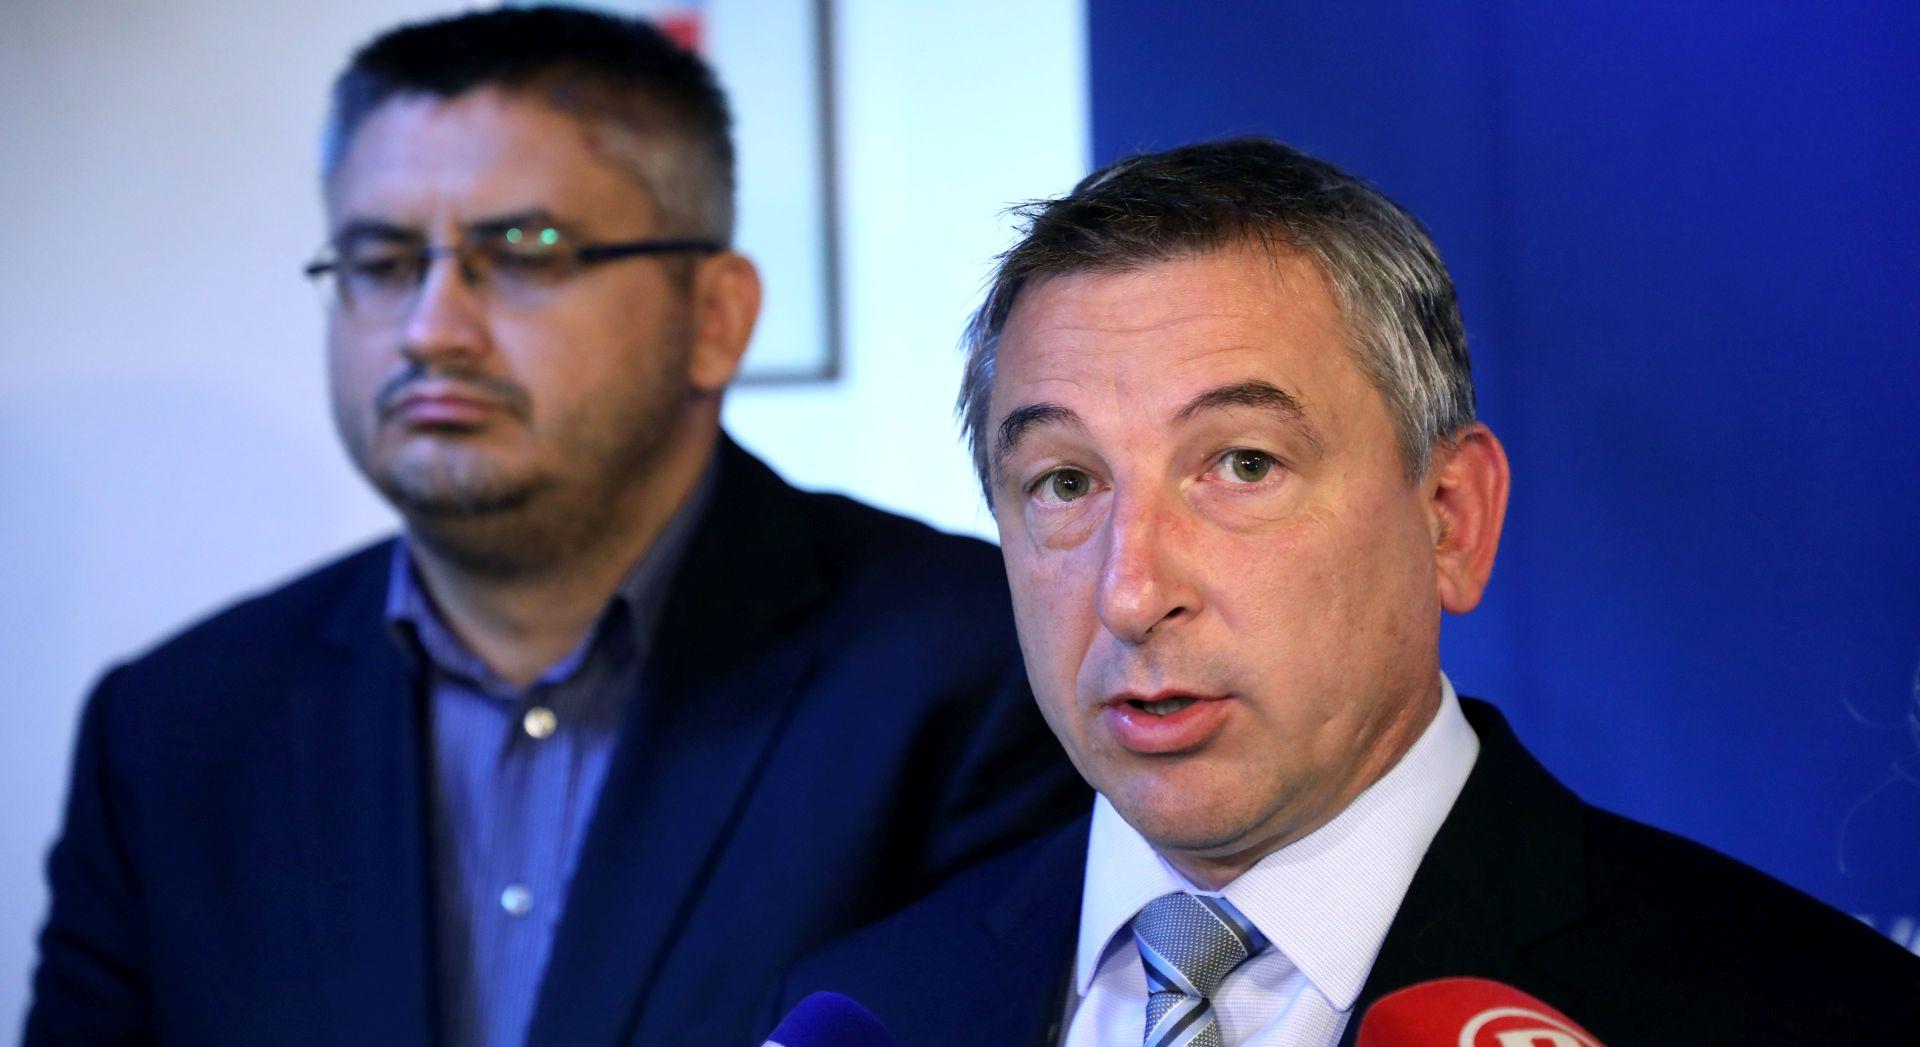 ŠTROMAR 'Upitnik Ministarstva obrazovanja nije odobrenje za rad, već informacija o zainteresiranosti'